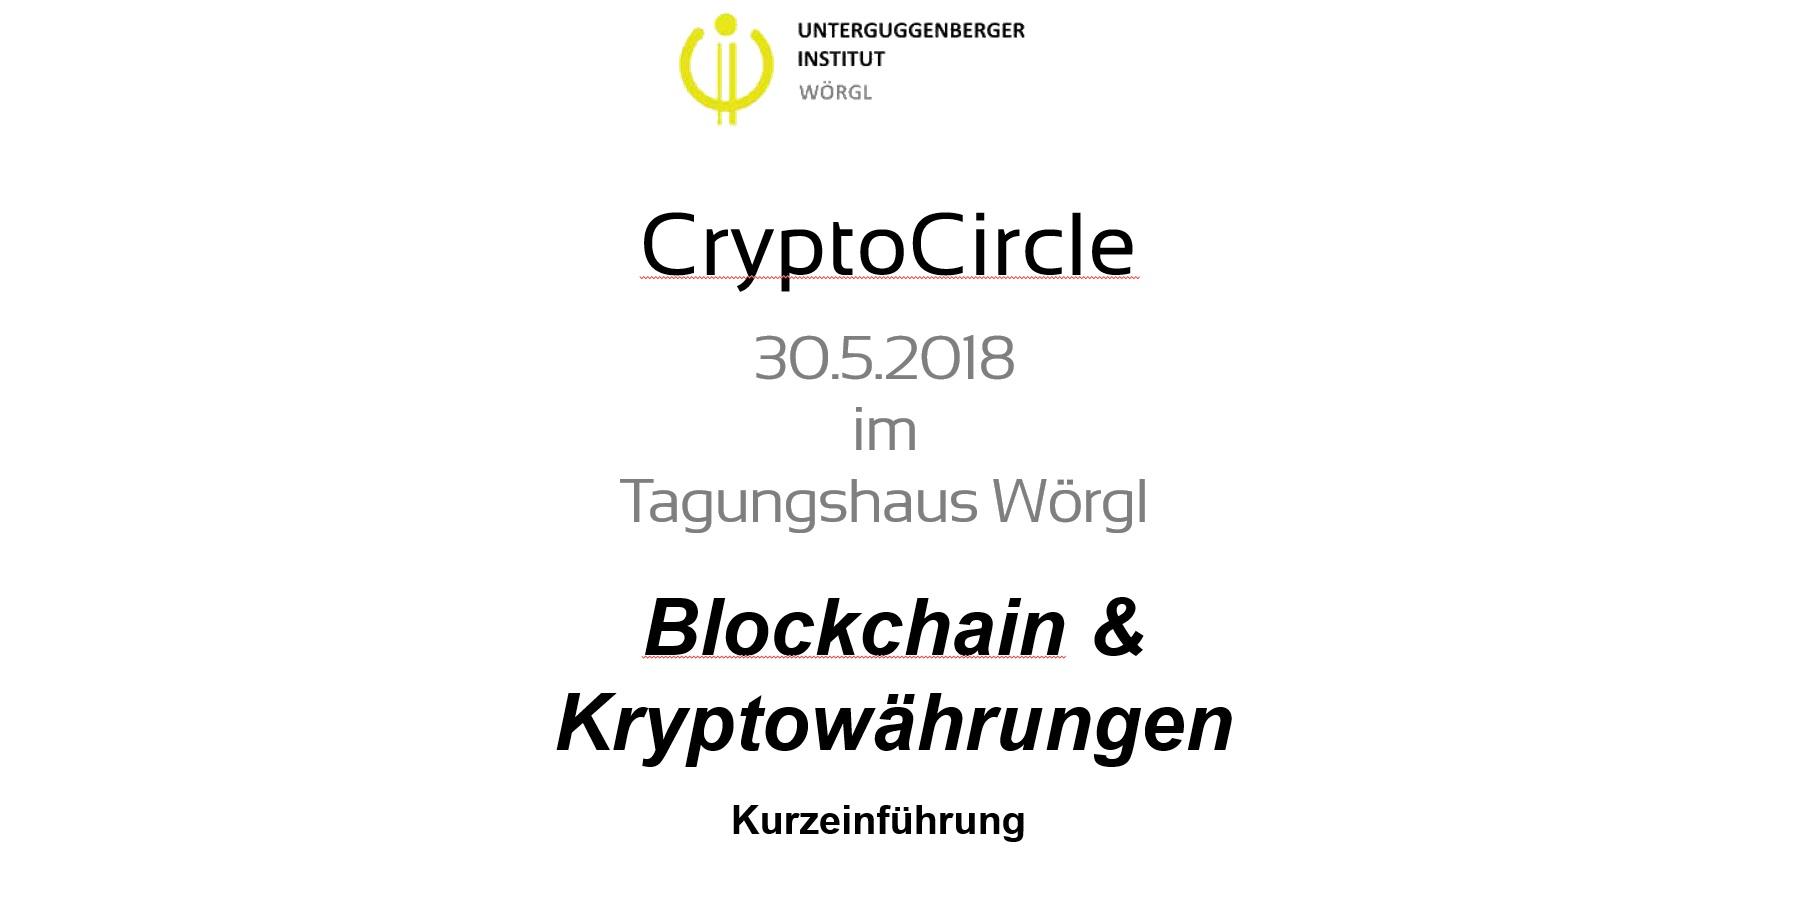 CryptoCircle Mai 2018 Blockchain Kryptowaehrungen Kurzeinfuehrung Tagungshaus Woergl Unterguggenberger Institut Heinz Johann Hafner